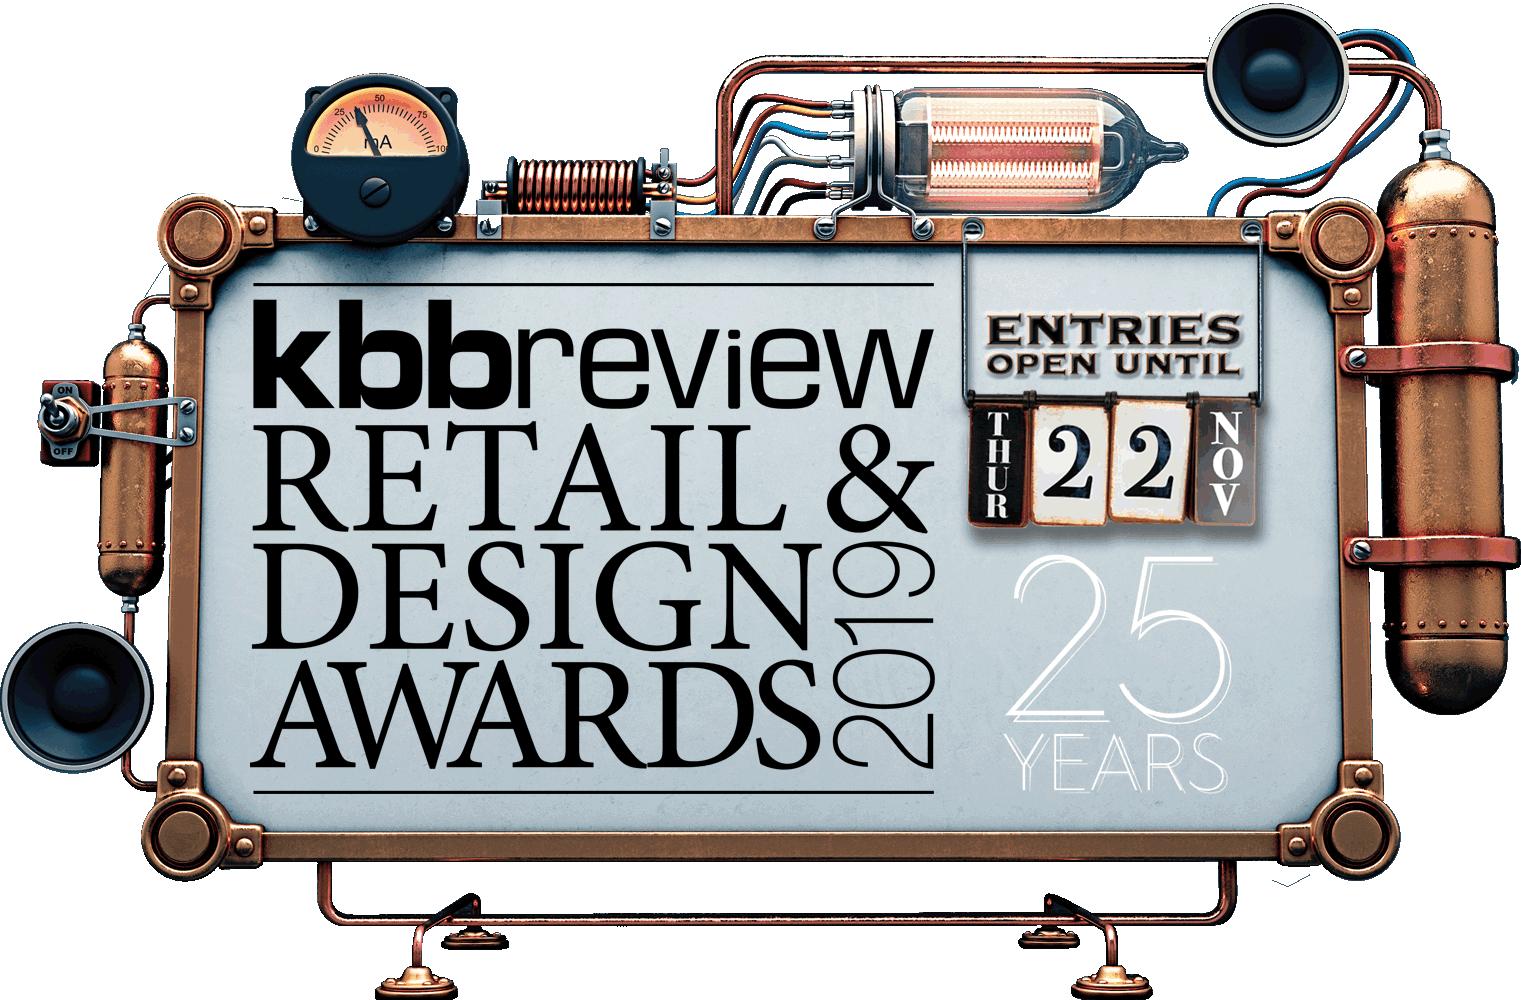 2019 - kbbreview Retail & Design Awards 2019